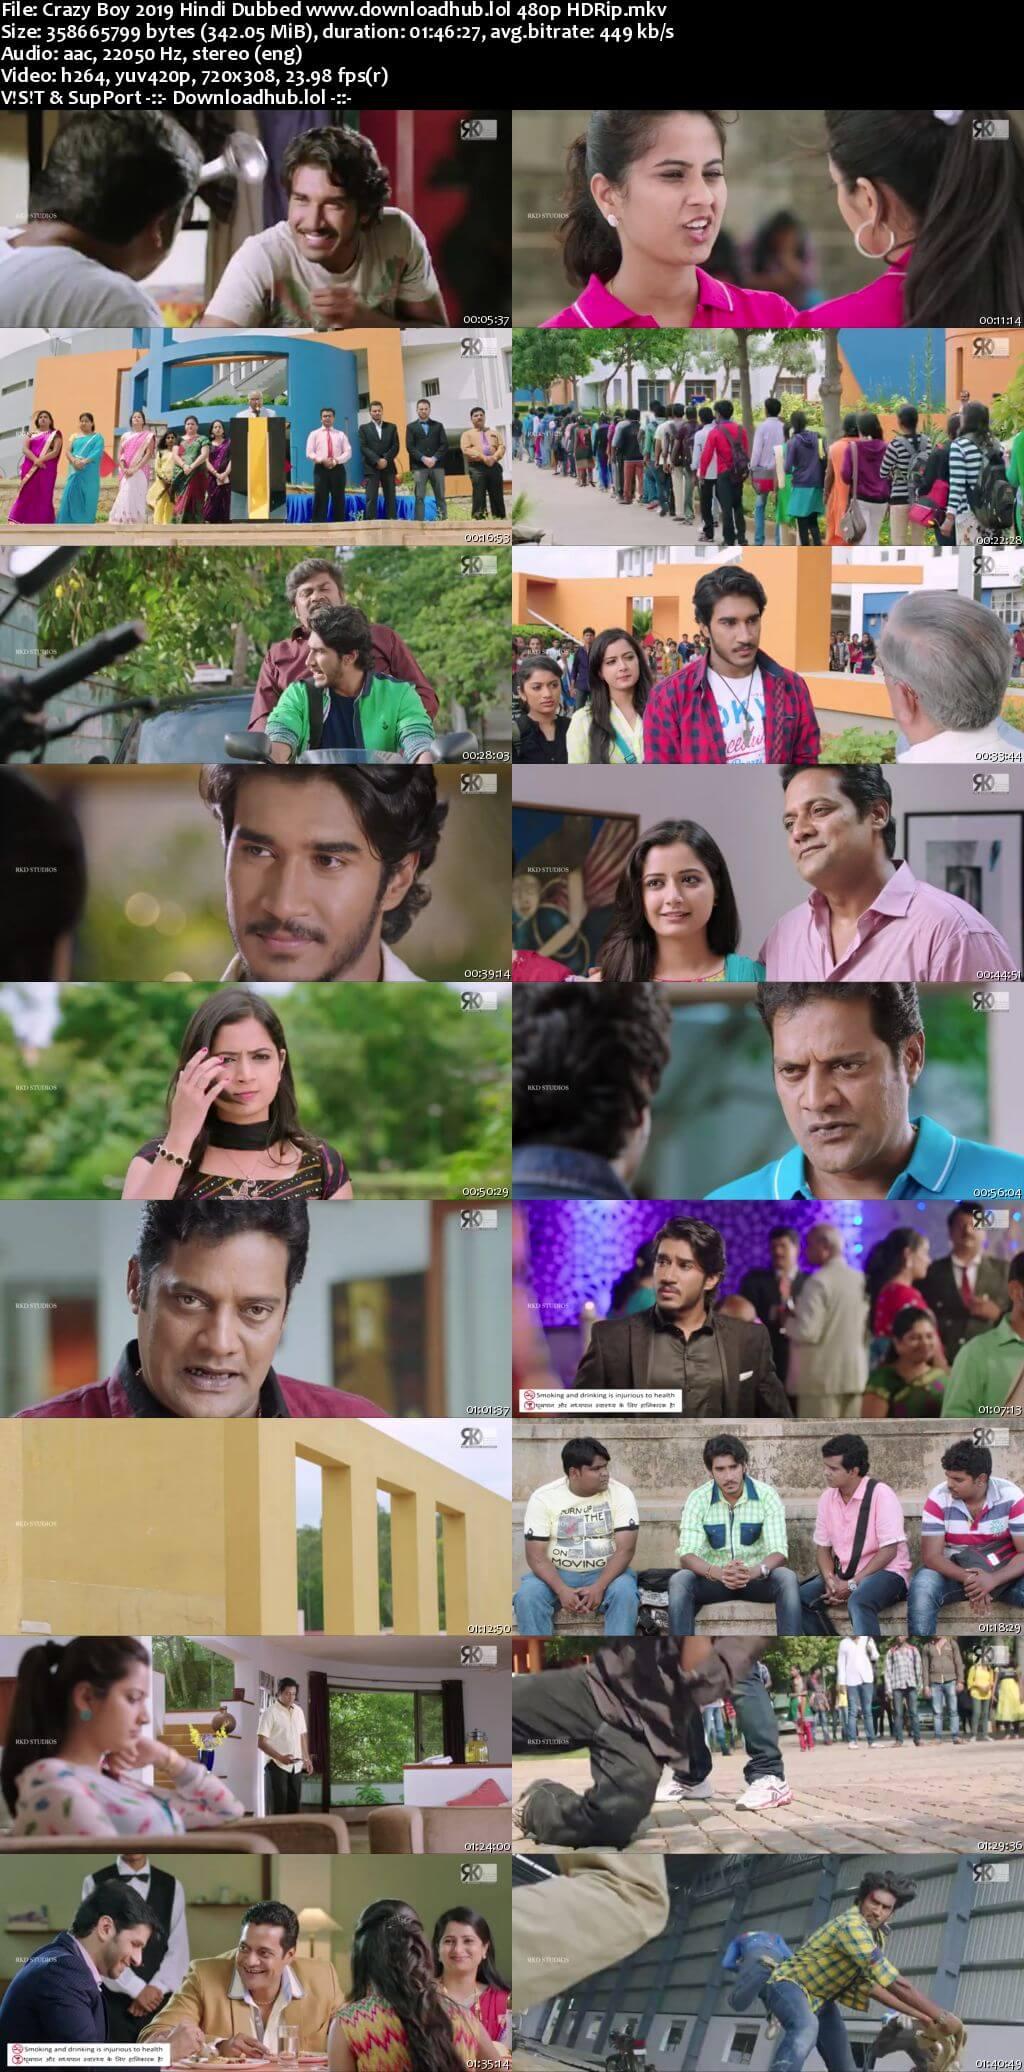 Crazy Boy 2019 Hindi Dubbed 300MB HDRip 480p